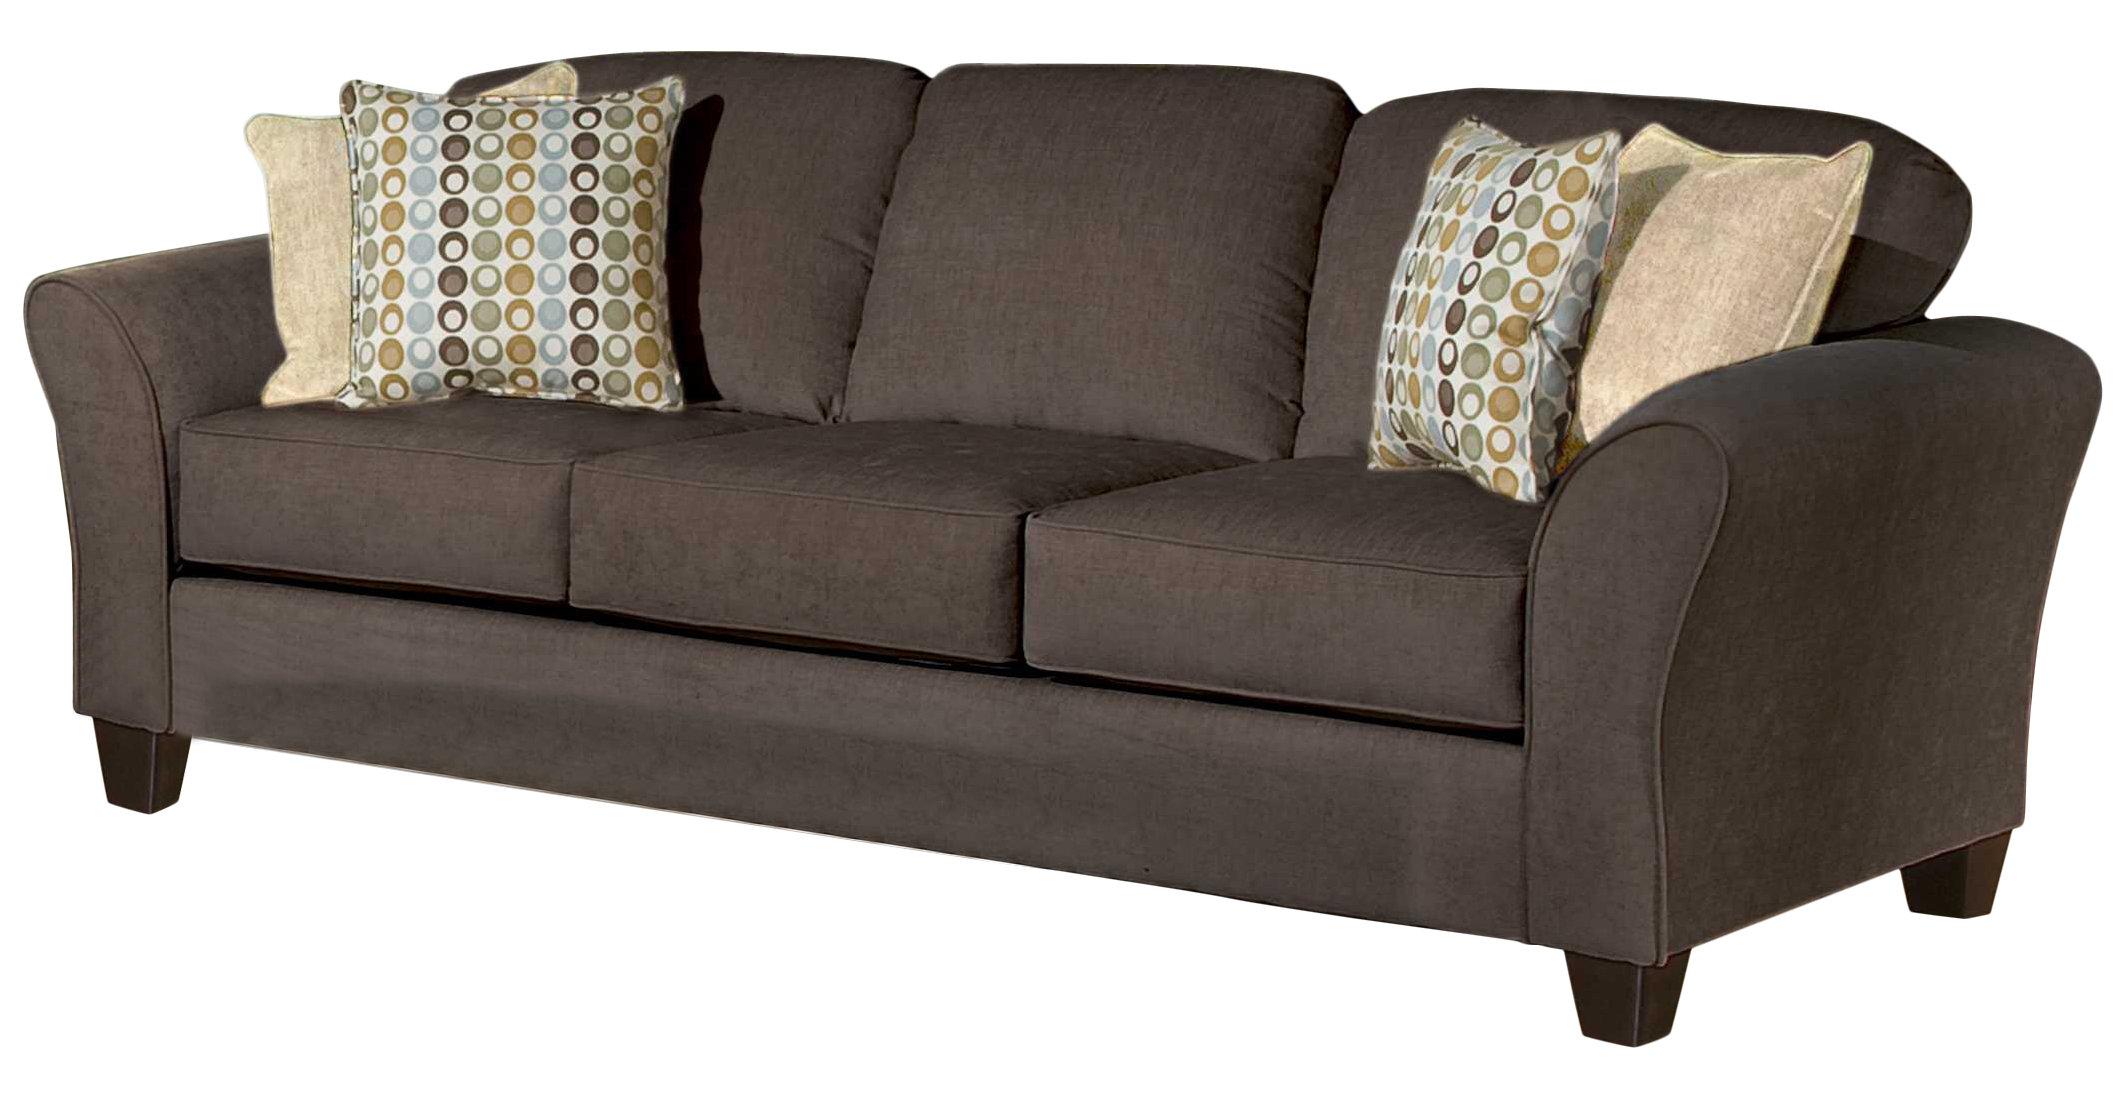 sofa upholstery three posts serta upholstery franklin sofa u0026 reviews | wayfair DYAMFJF